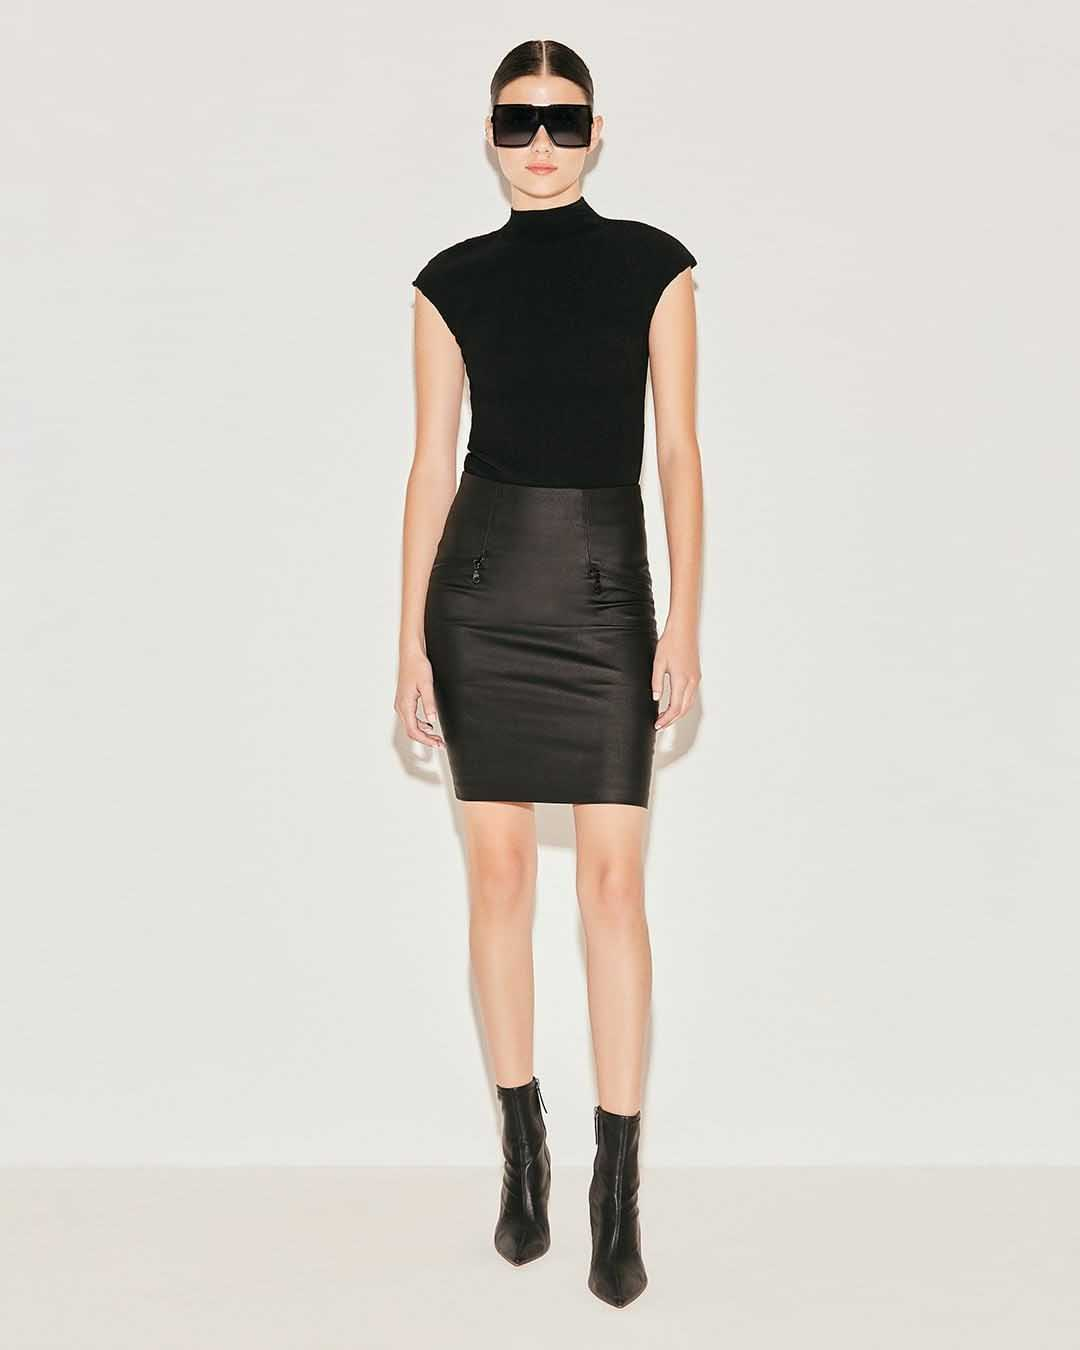 minifalda invierno 2021 moda mujer